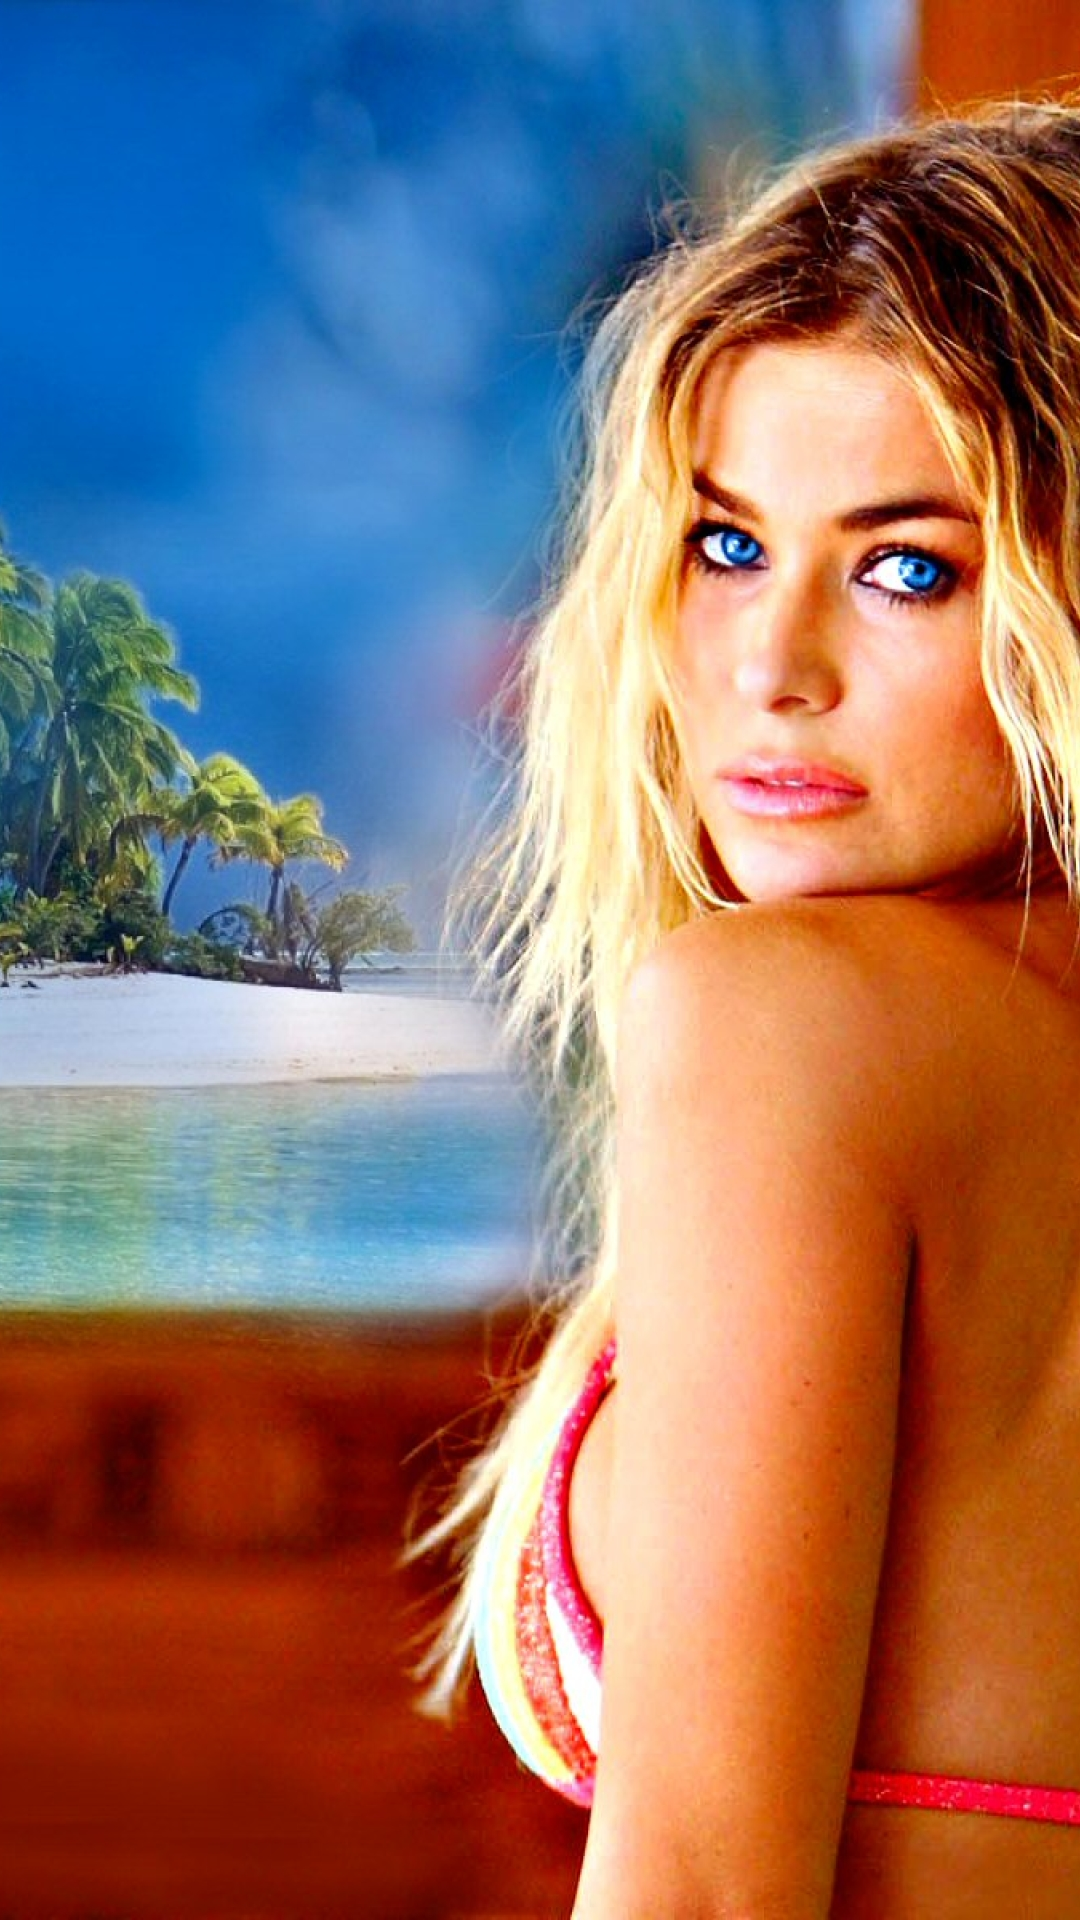 Carmen Electra Sexy Photoshoot, Full Hd Wallpaper-7233